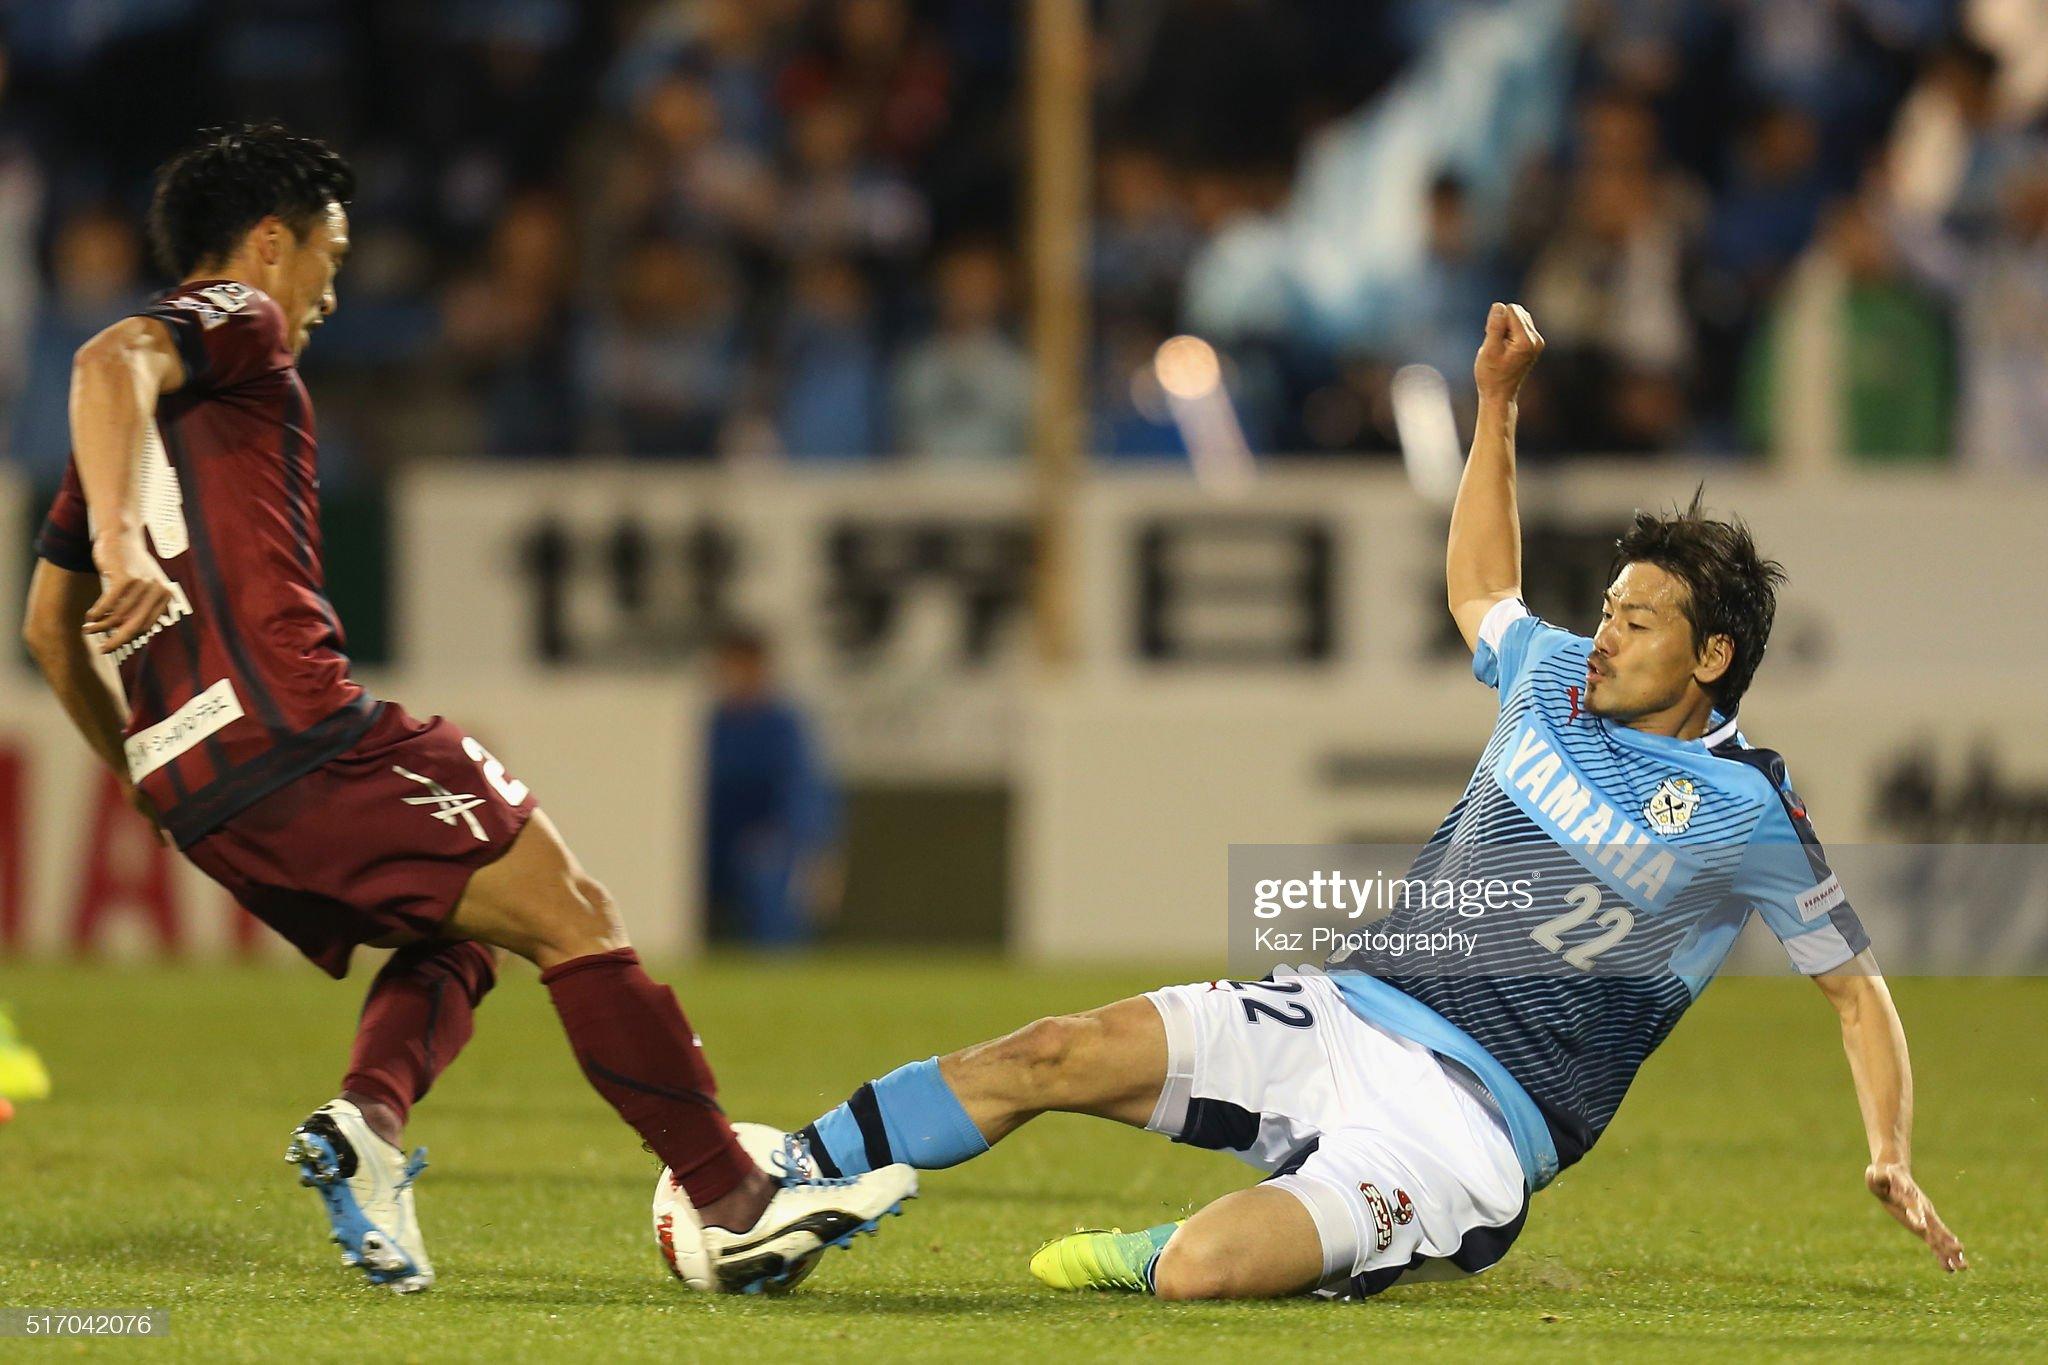 daisuke-matsui-of-jubilo-iwata-tackles-m